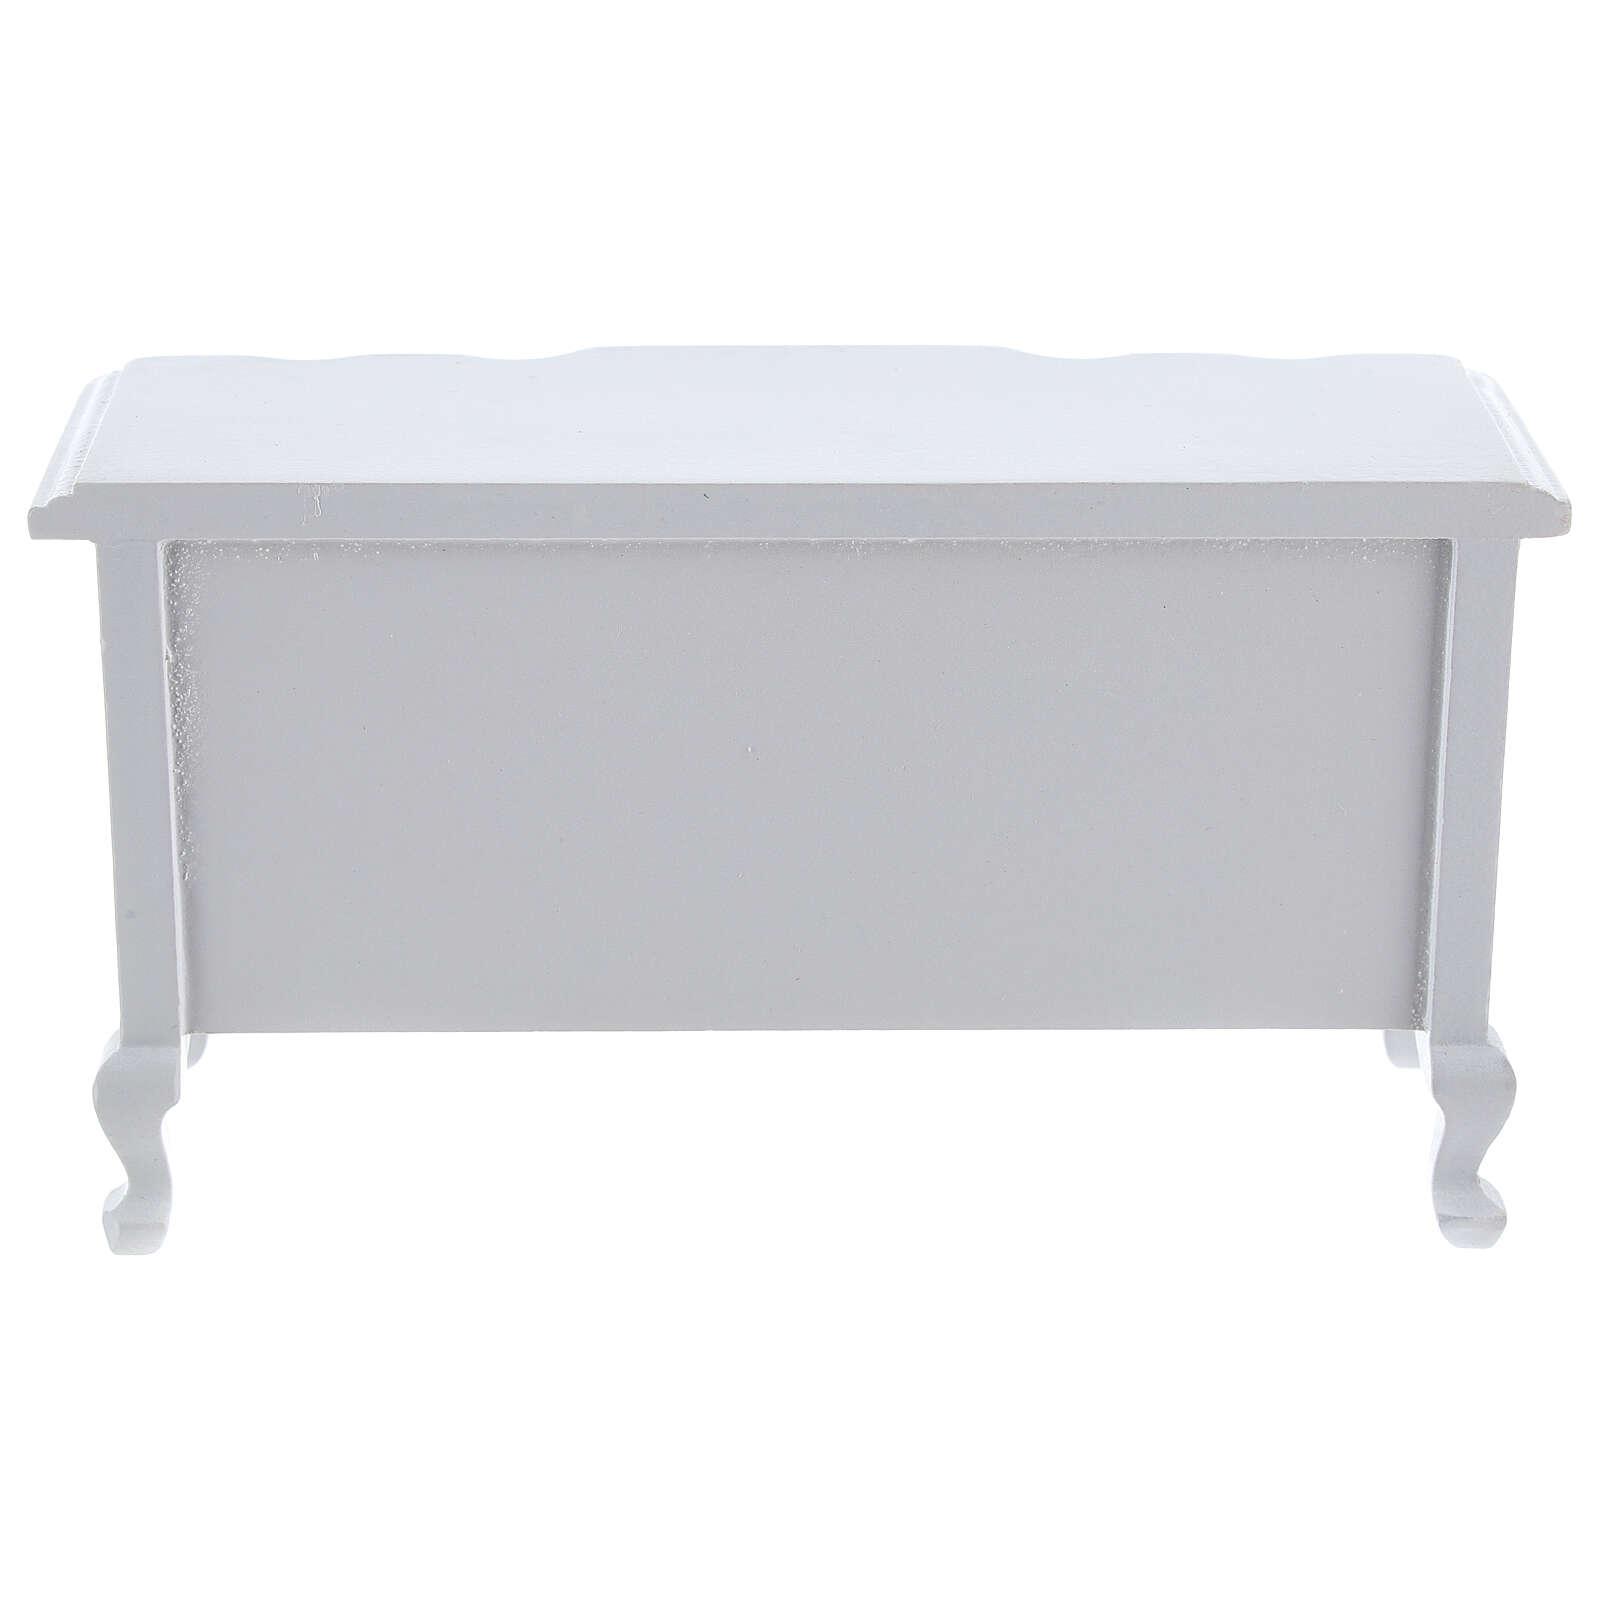 Furniture in white wood room 7 pieces Nativity scene 12 cm 4